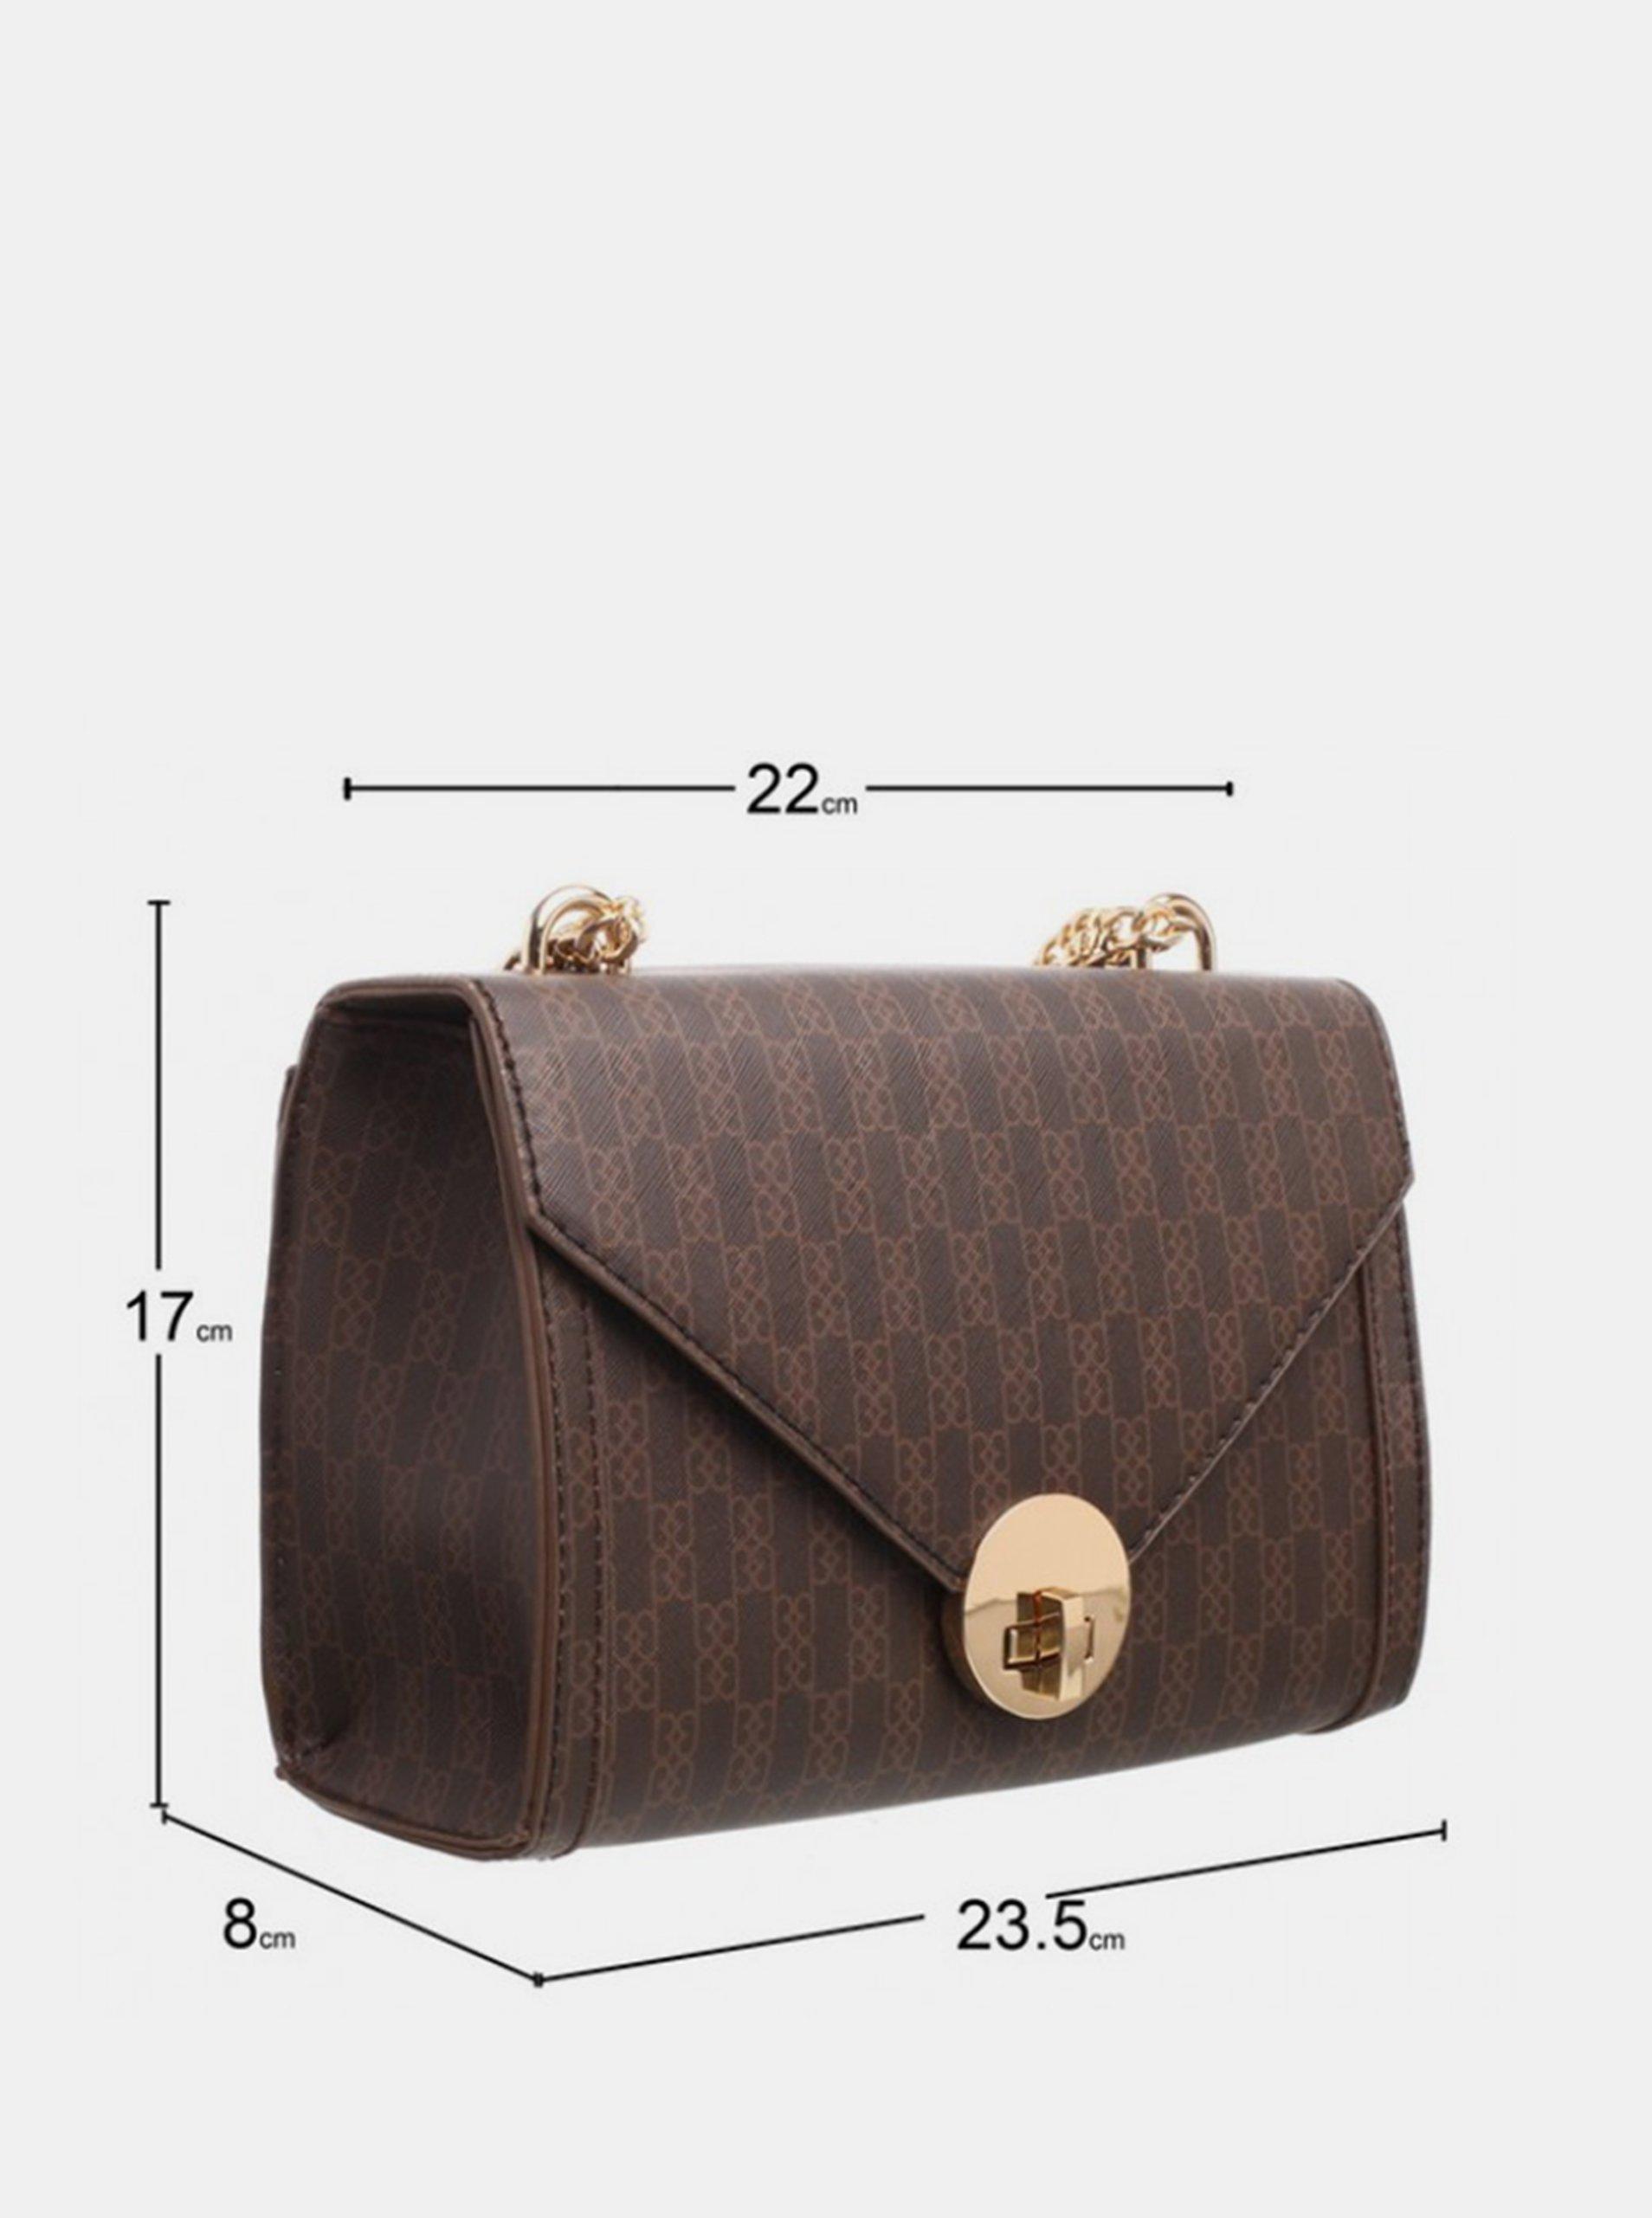 Bessie London brown crossbody handbag